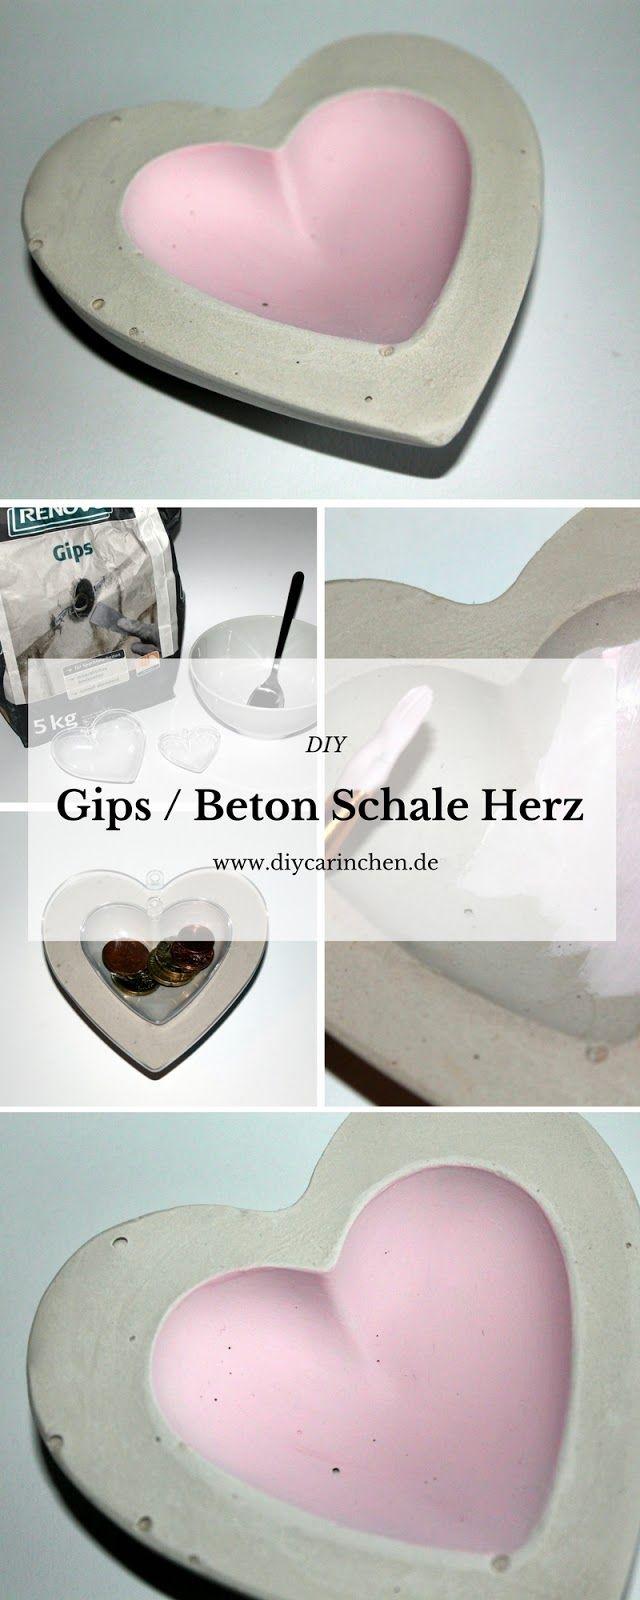 DIY Gips / Beton Schale Herz | Liebesgeschenke, Muttertagsgeschenke ...